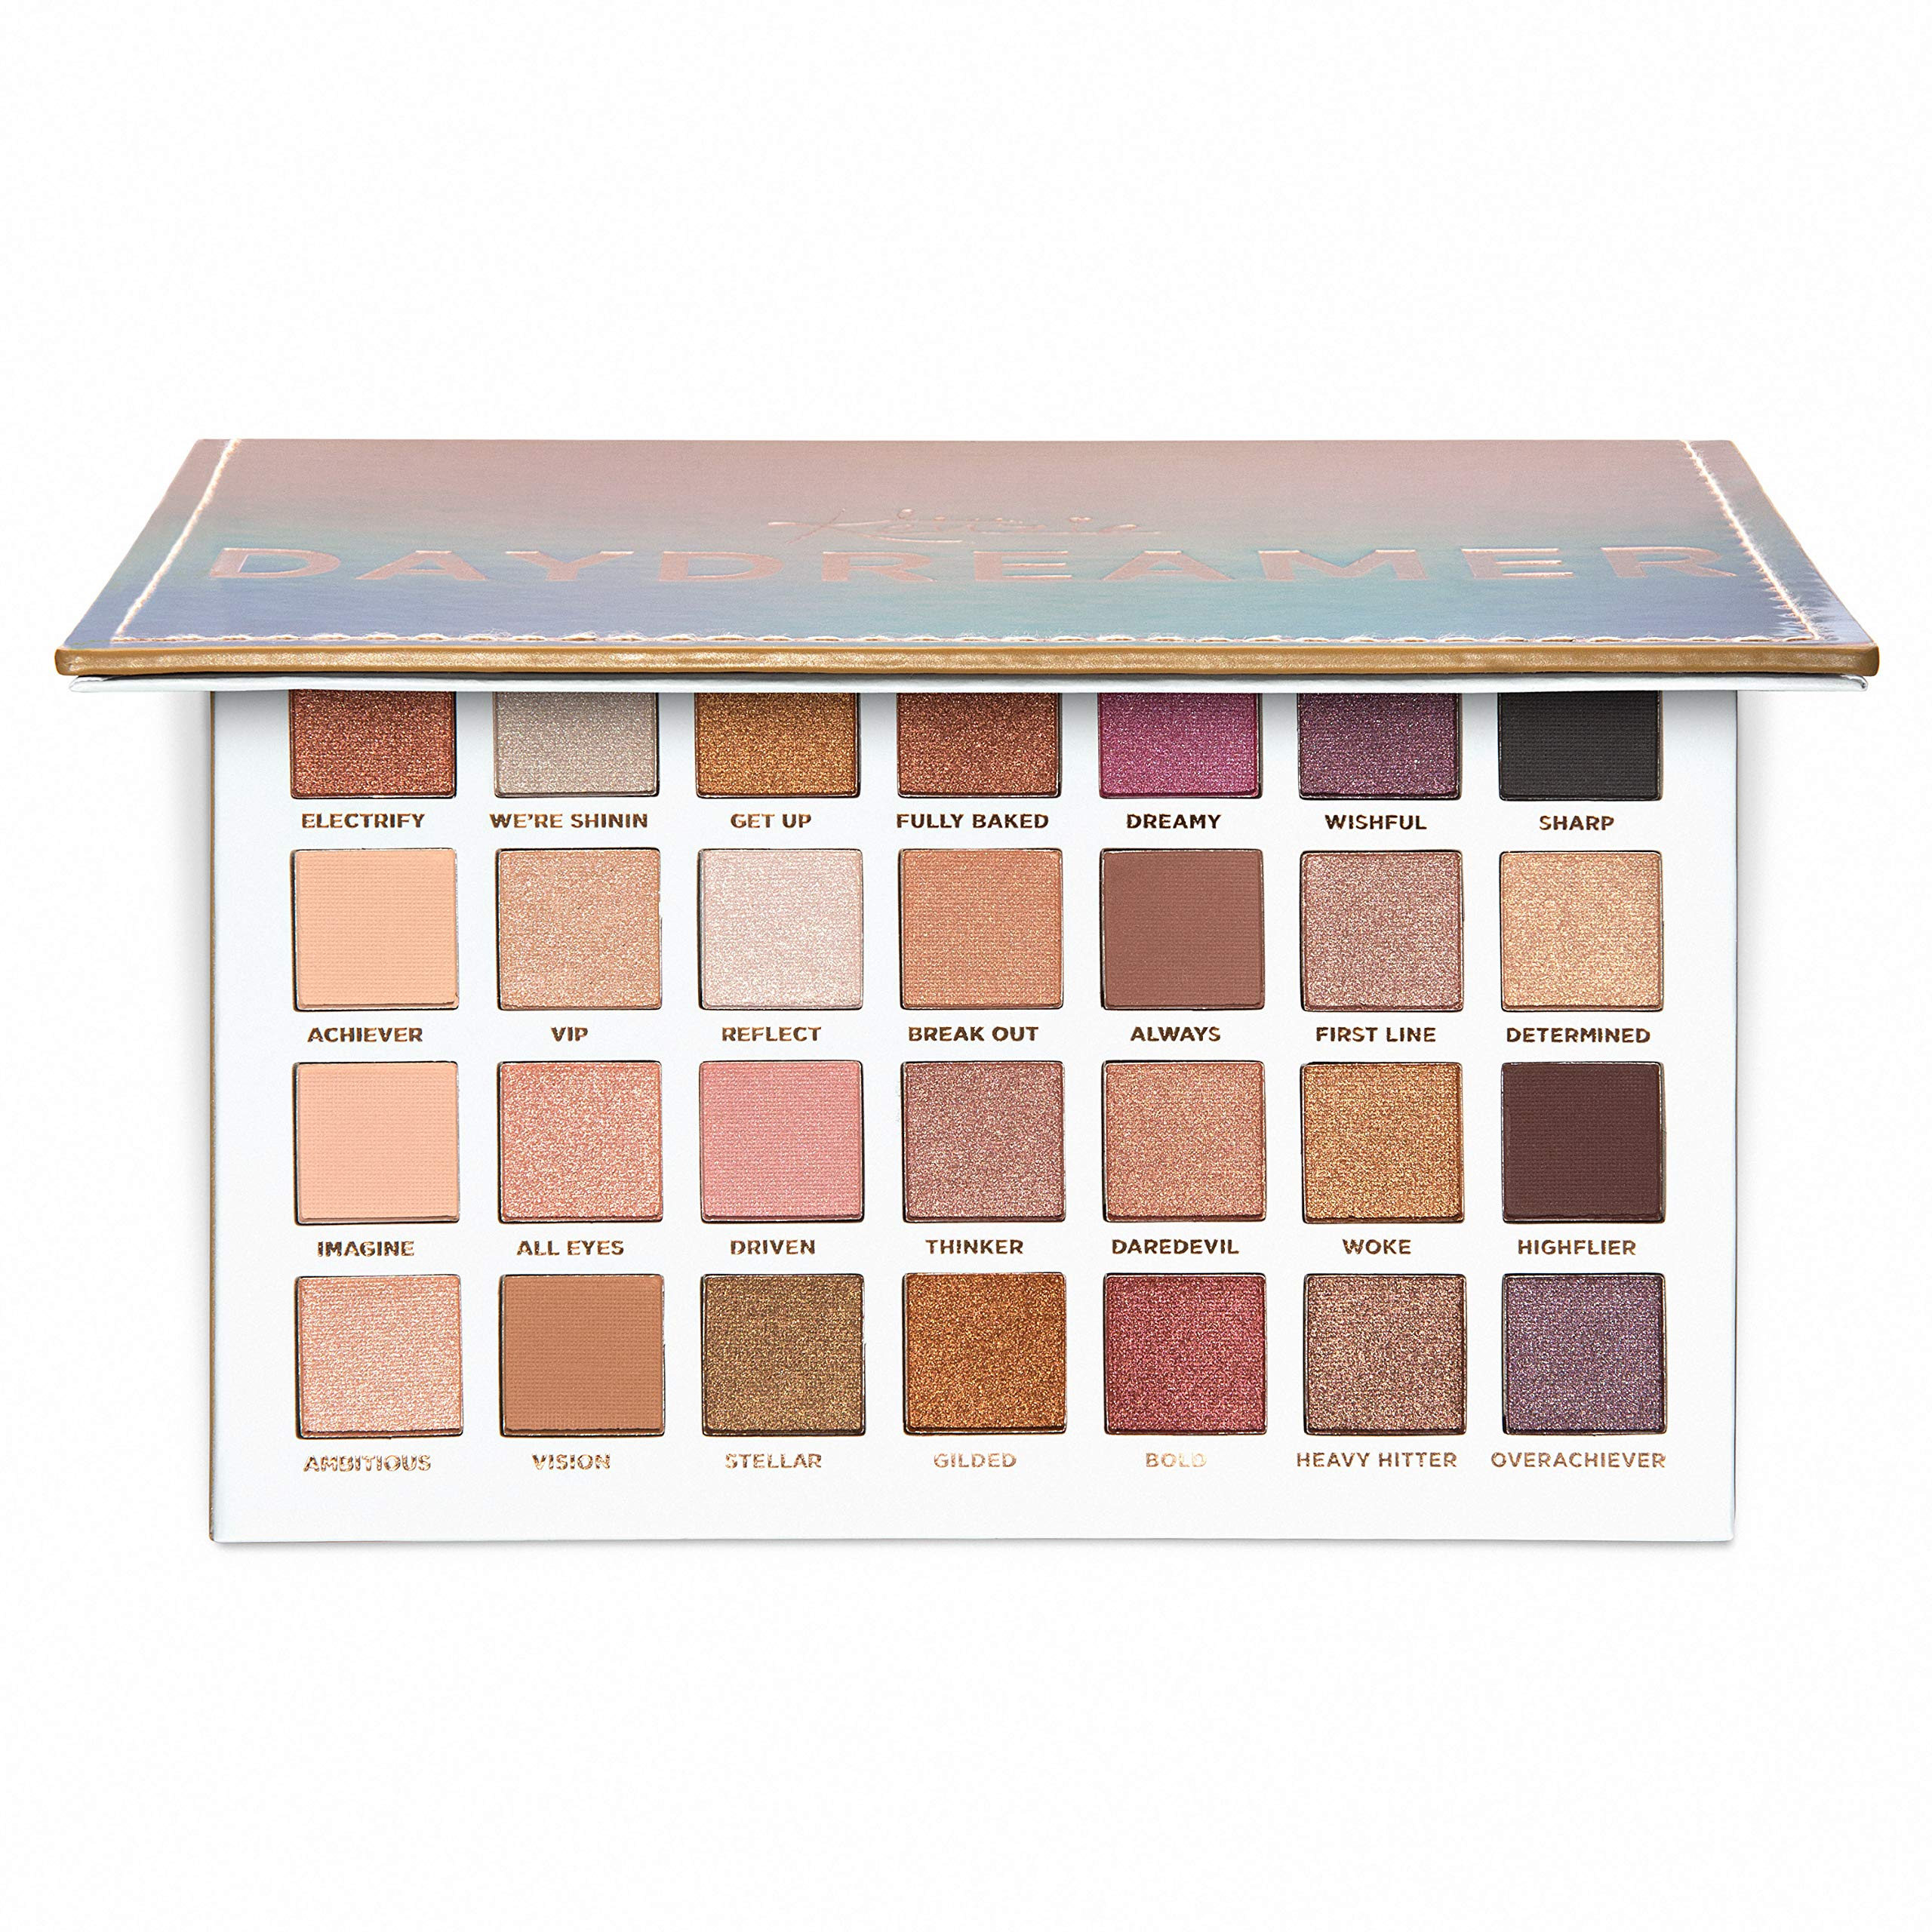 Love, Kenzie Beauty by Mackenzie Ziegler - Girls Cosmetics - Daydreamer Eyeshadow Palette - 28 Matte, Metallic, and Shimmer Shades